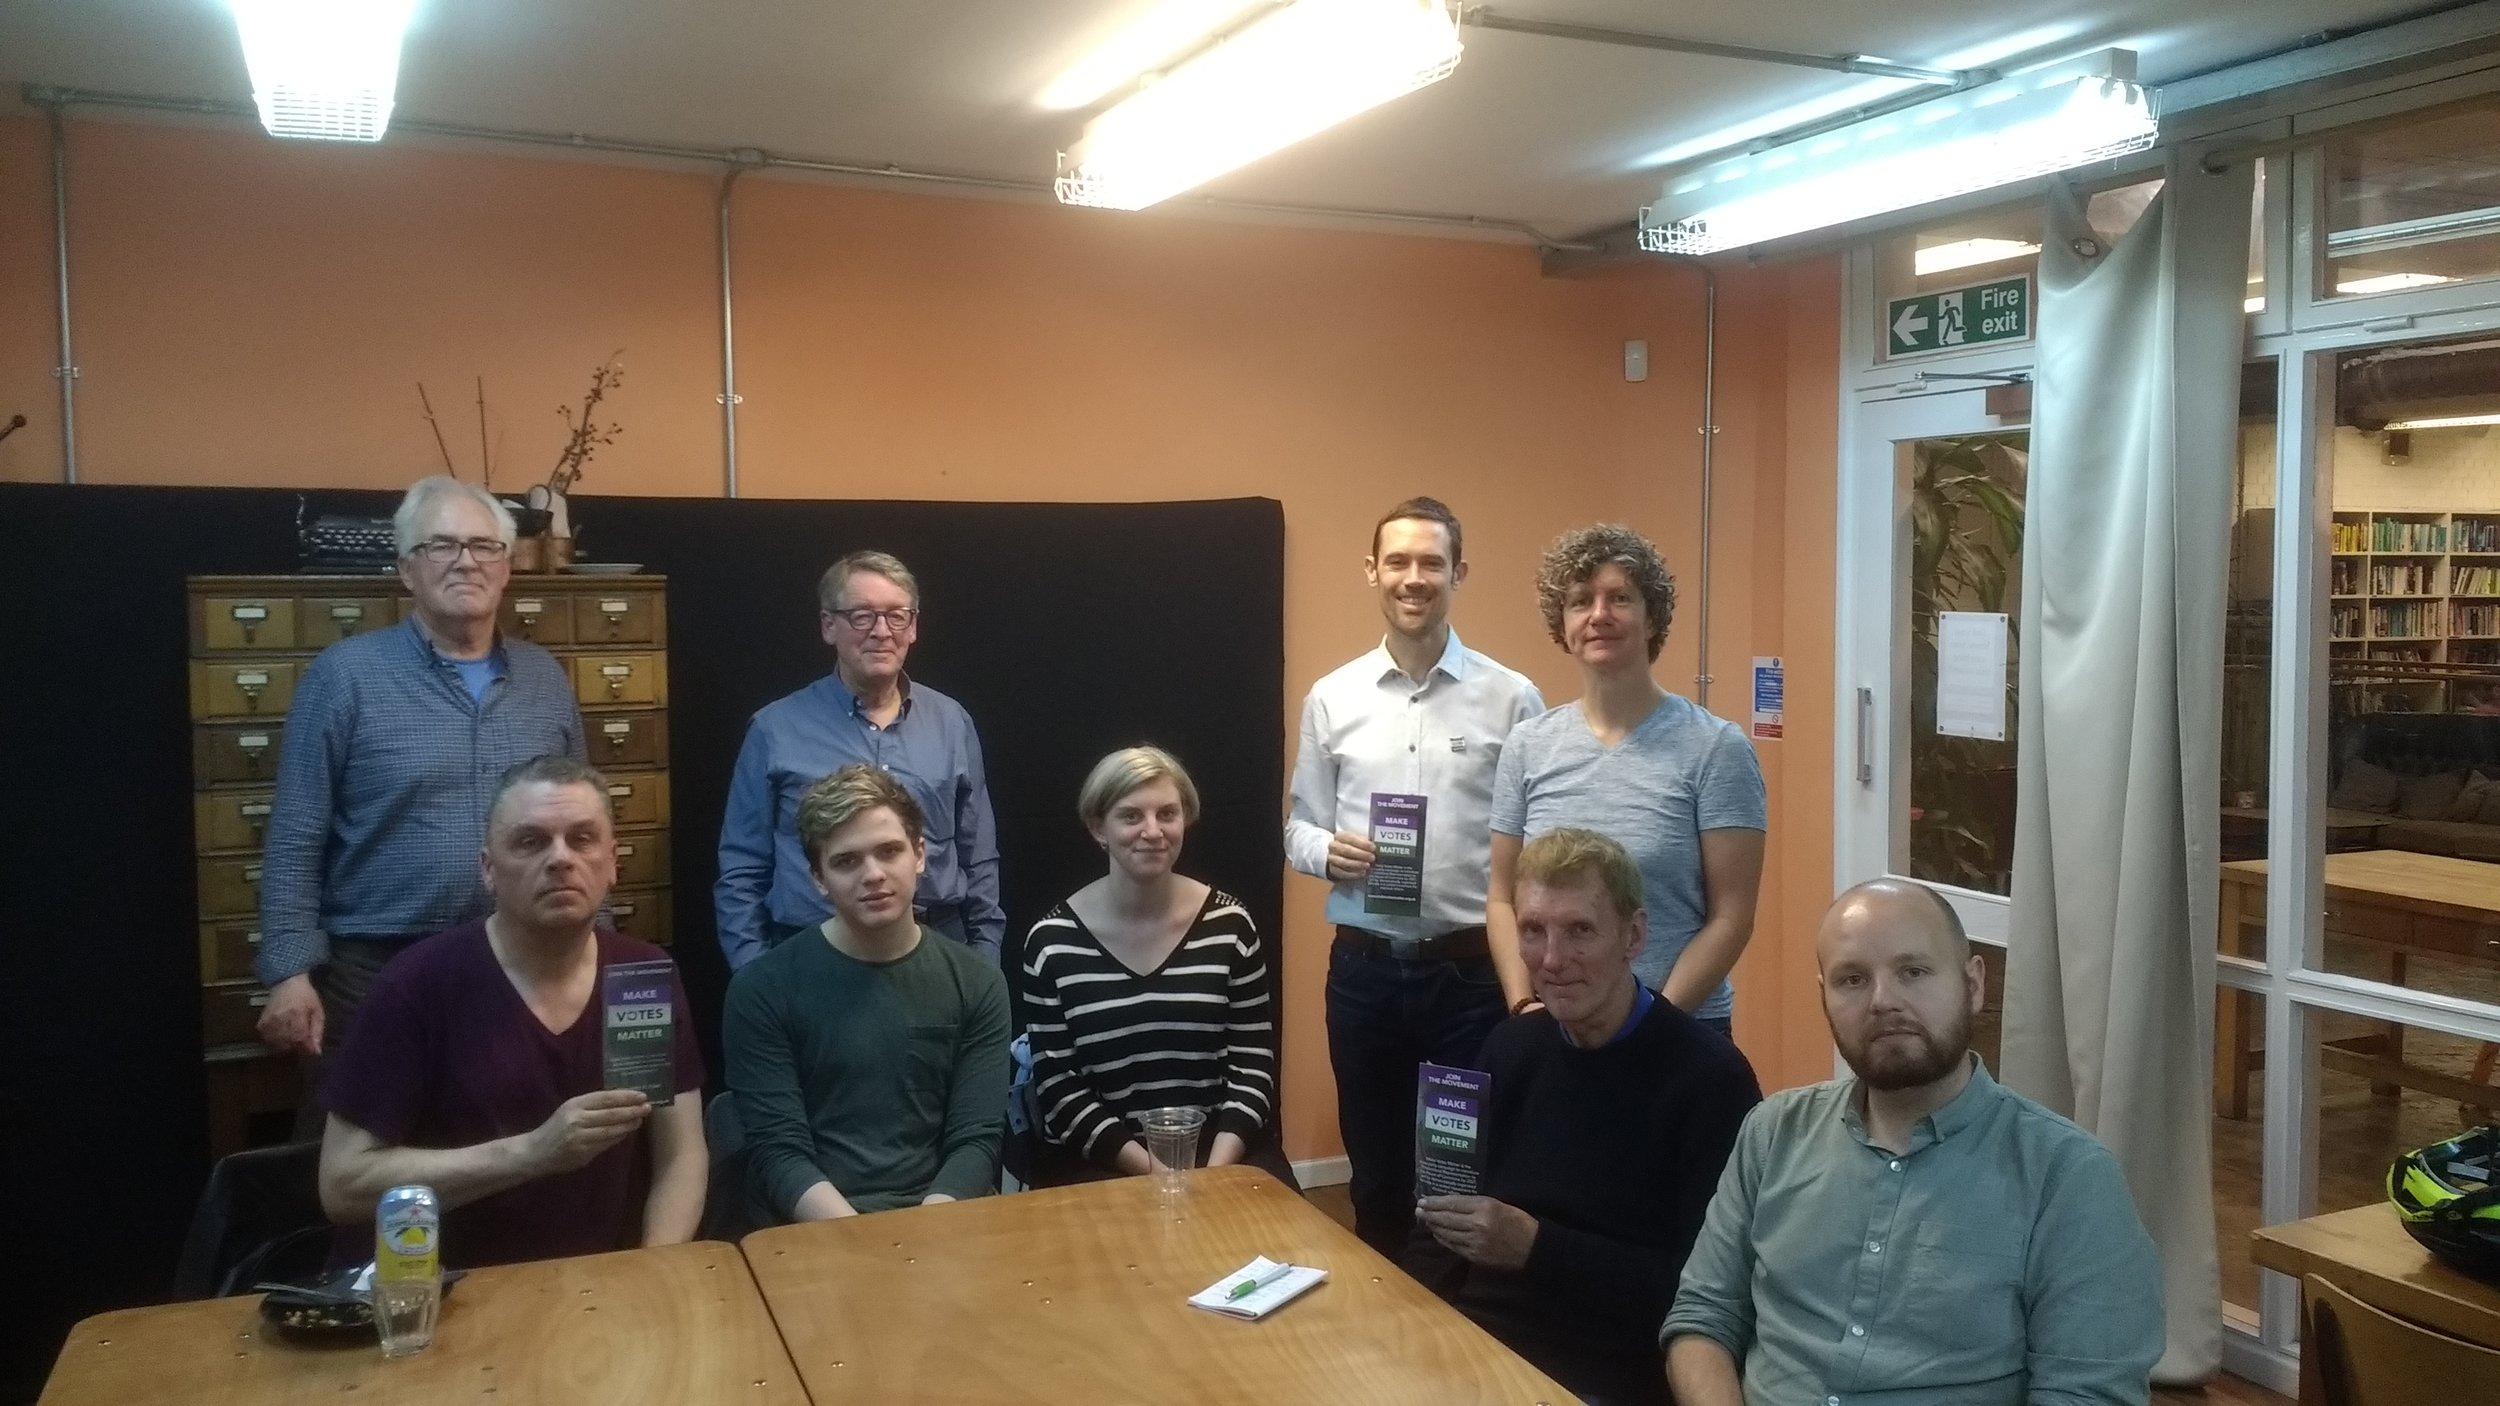 MVM East London at a previous meeting.